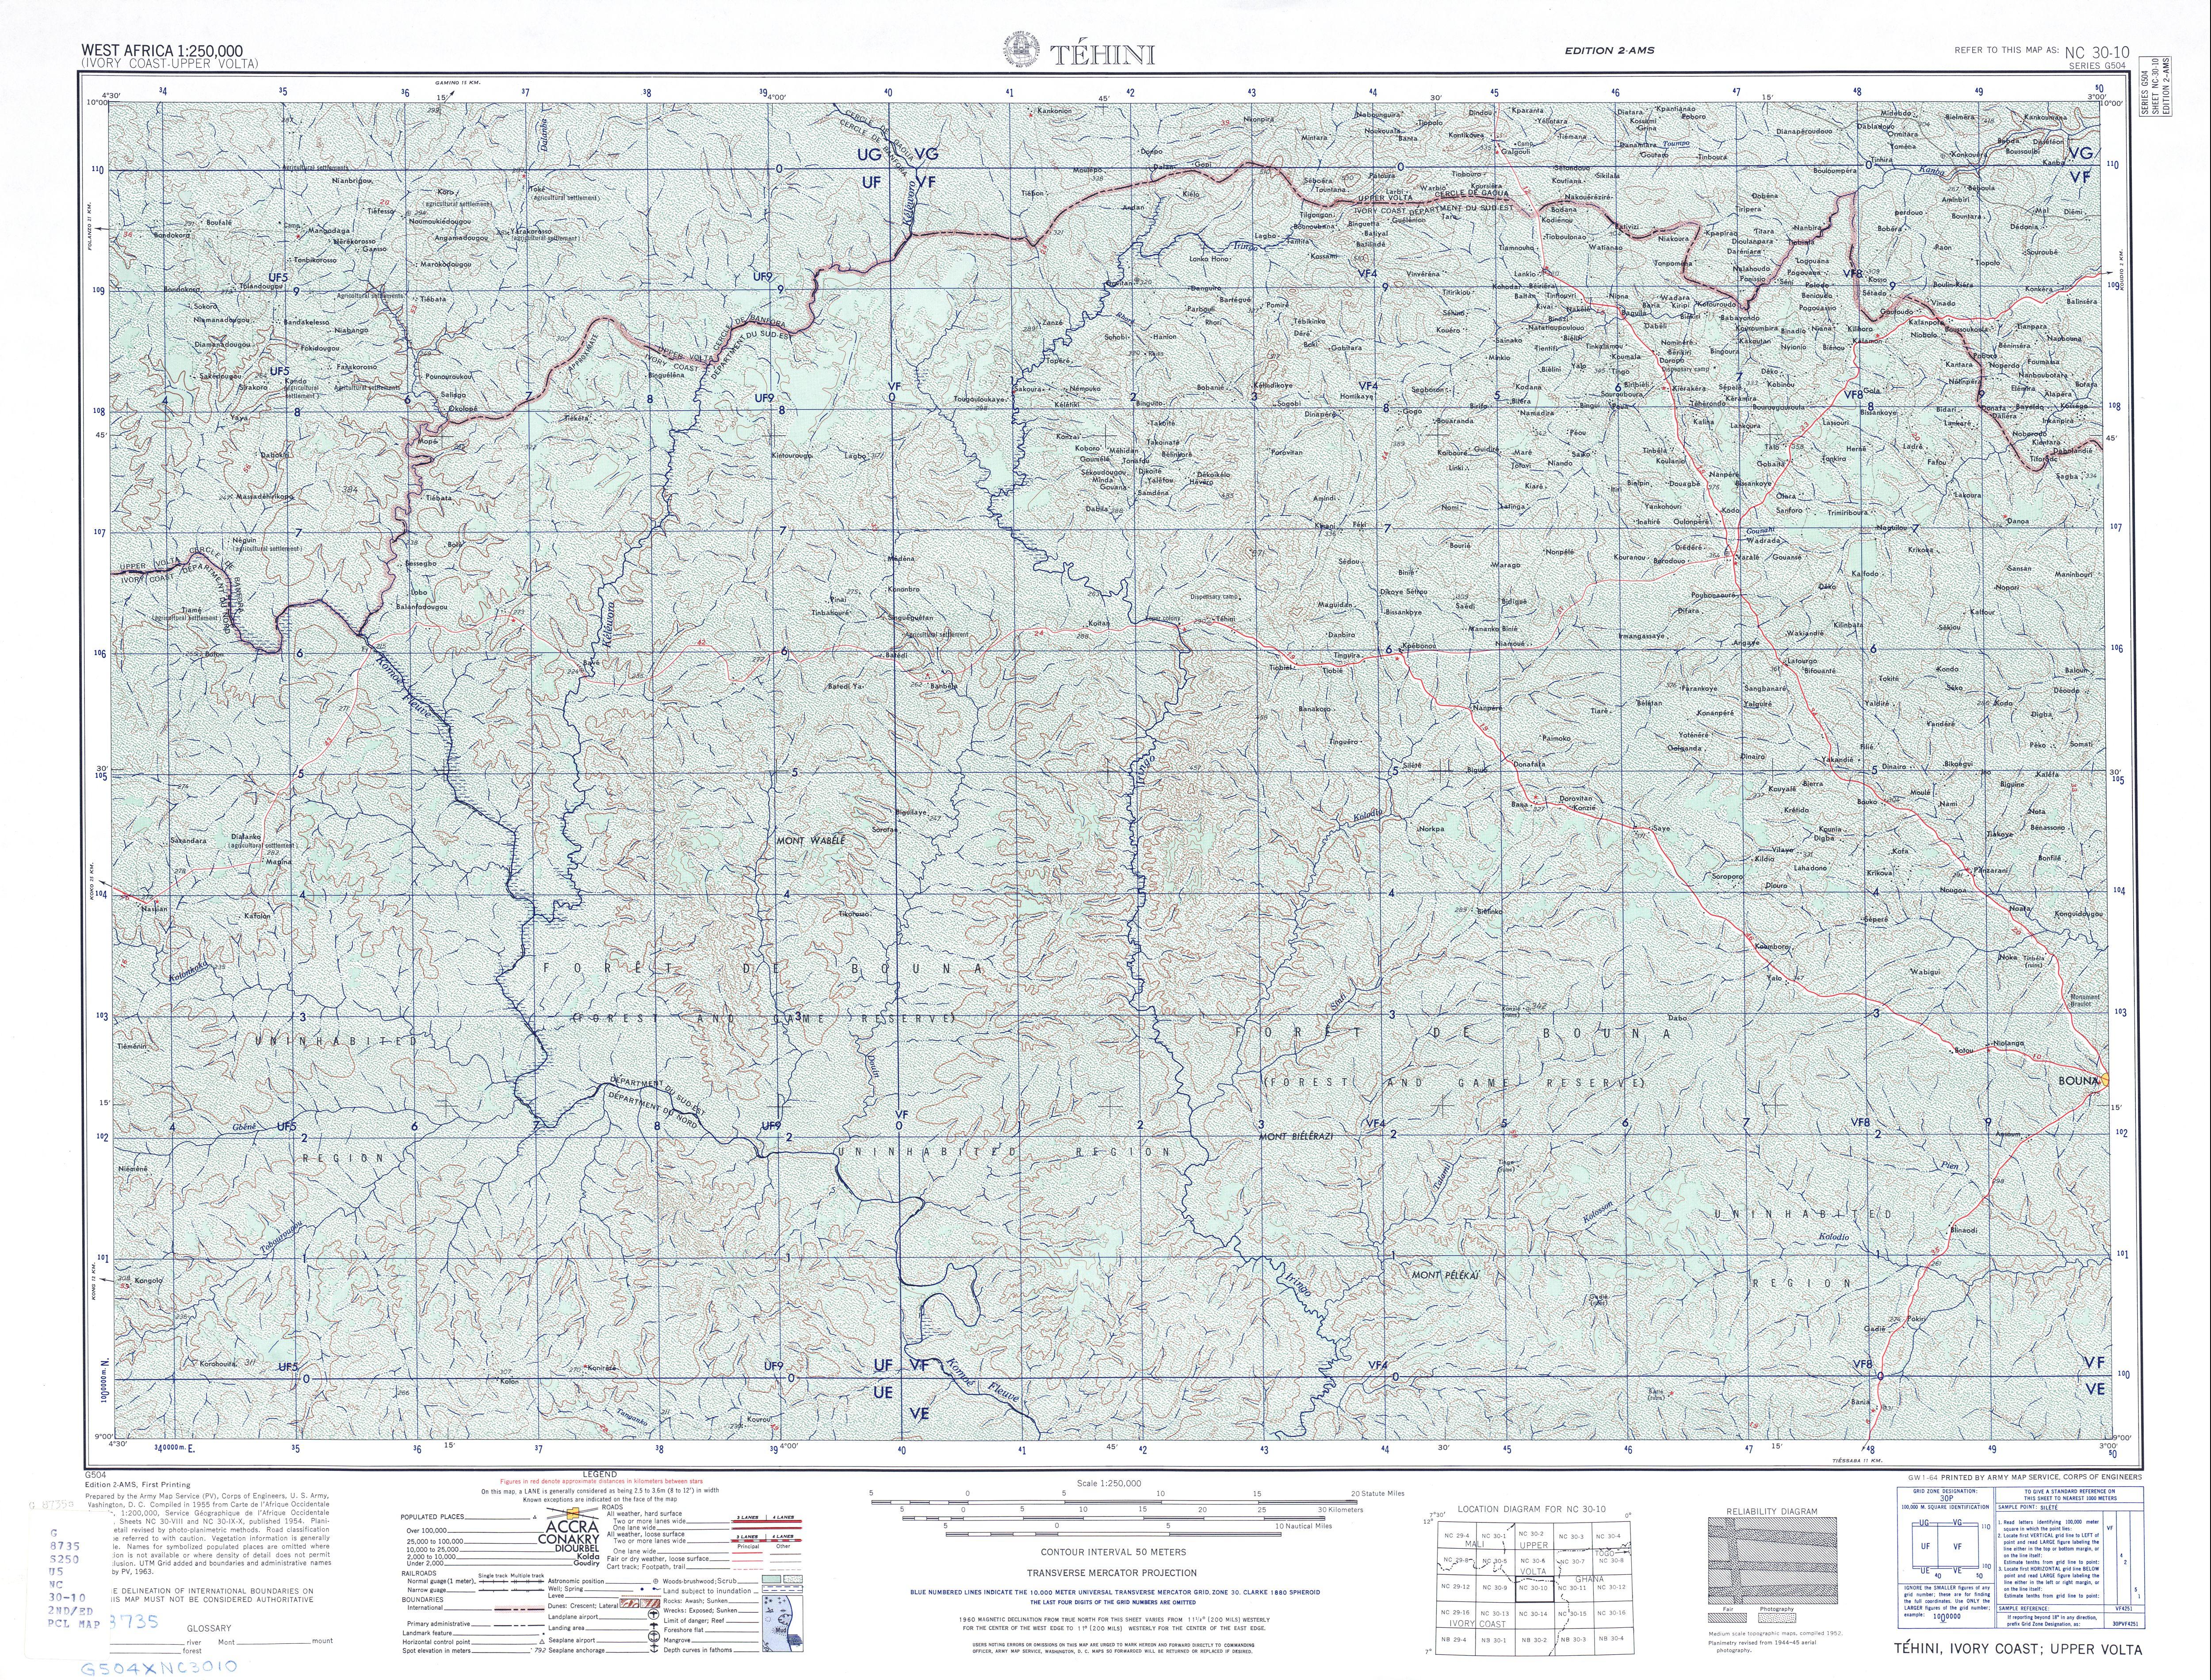 Hoja Tehini del Mapa Topográfico de África Occidental 1955